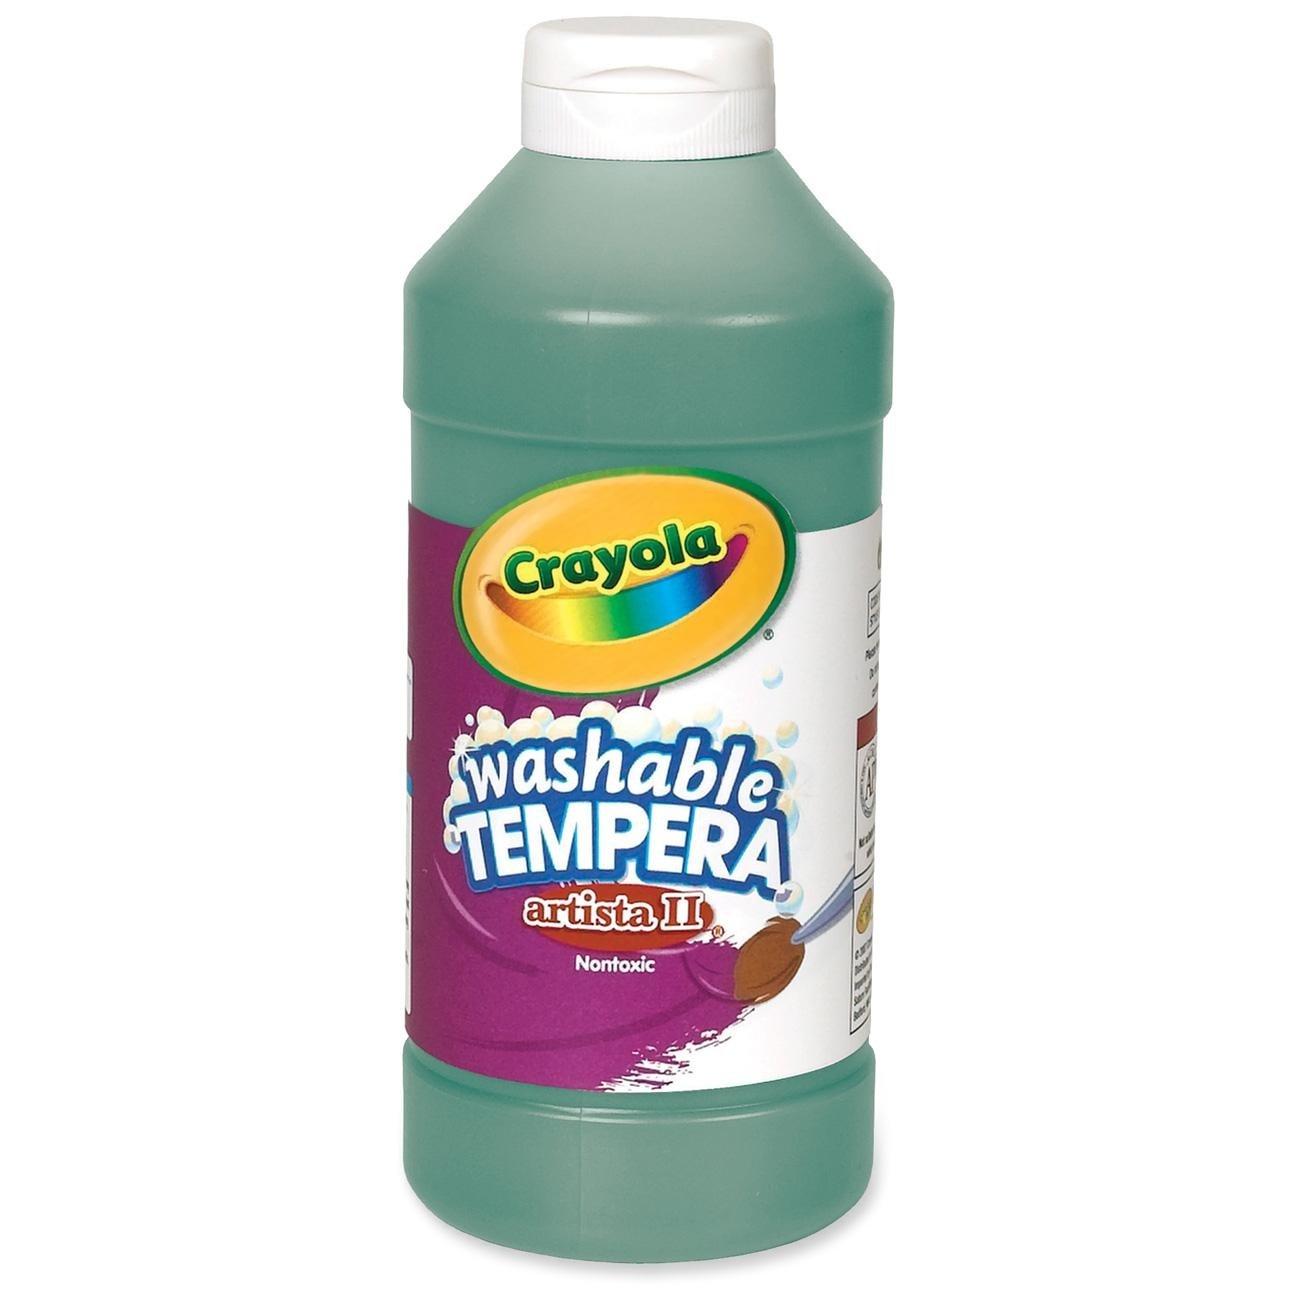 Crayola Artista II  Washable Tempera Paint, Pint, Green